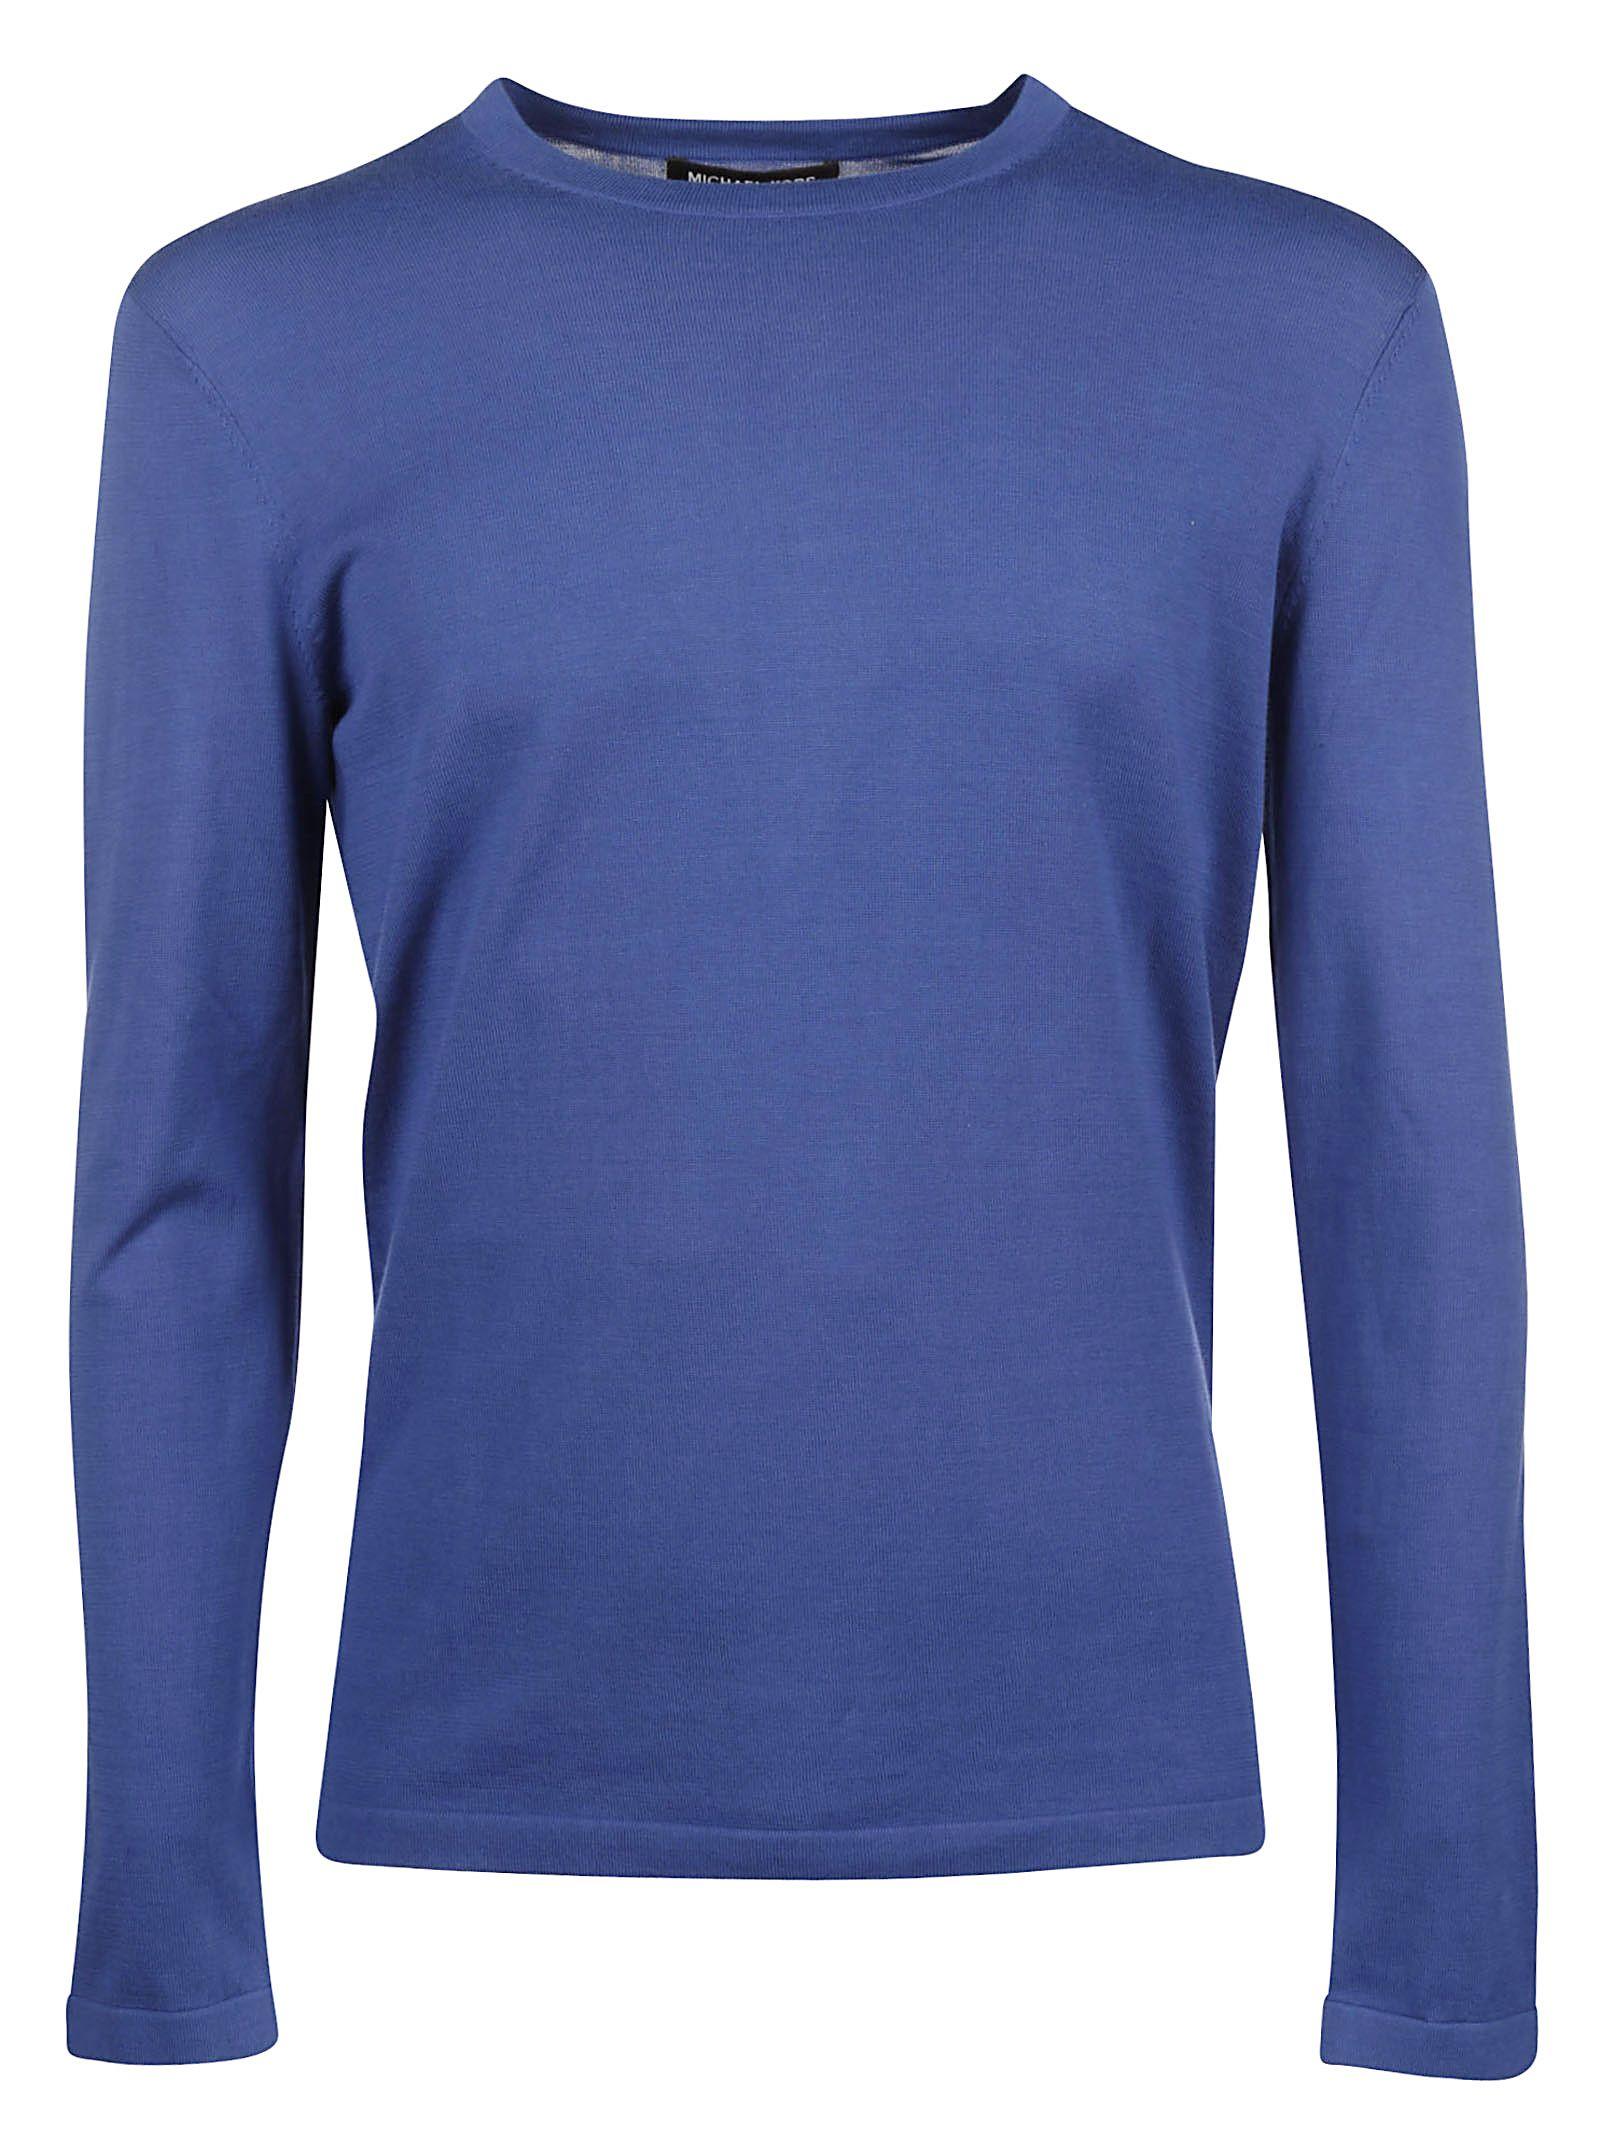 Michael Kors Cotton Sweater